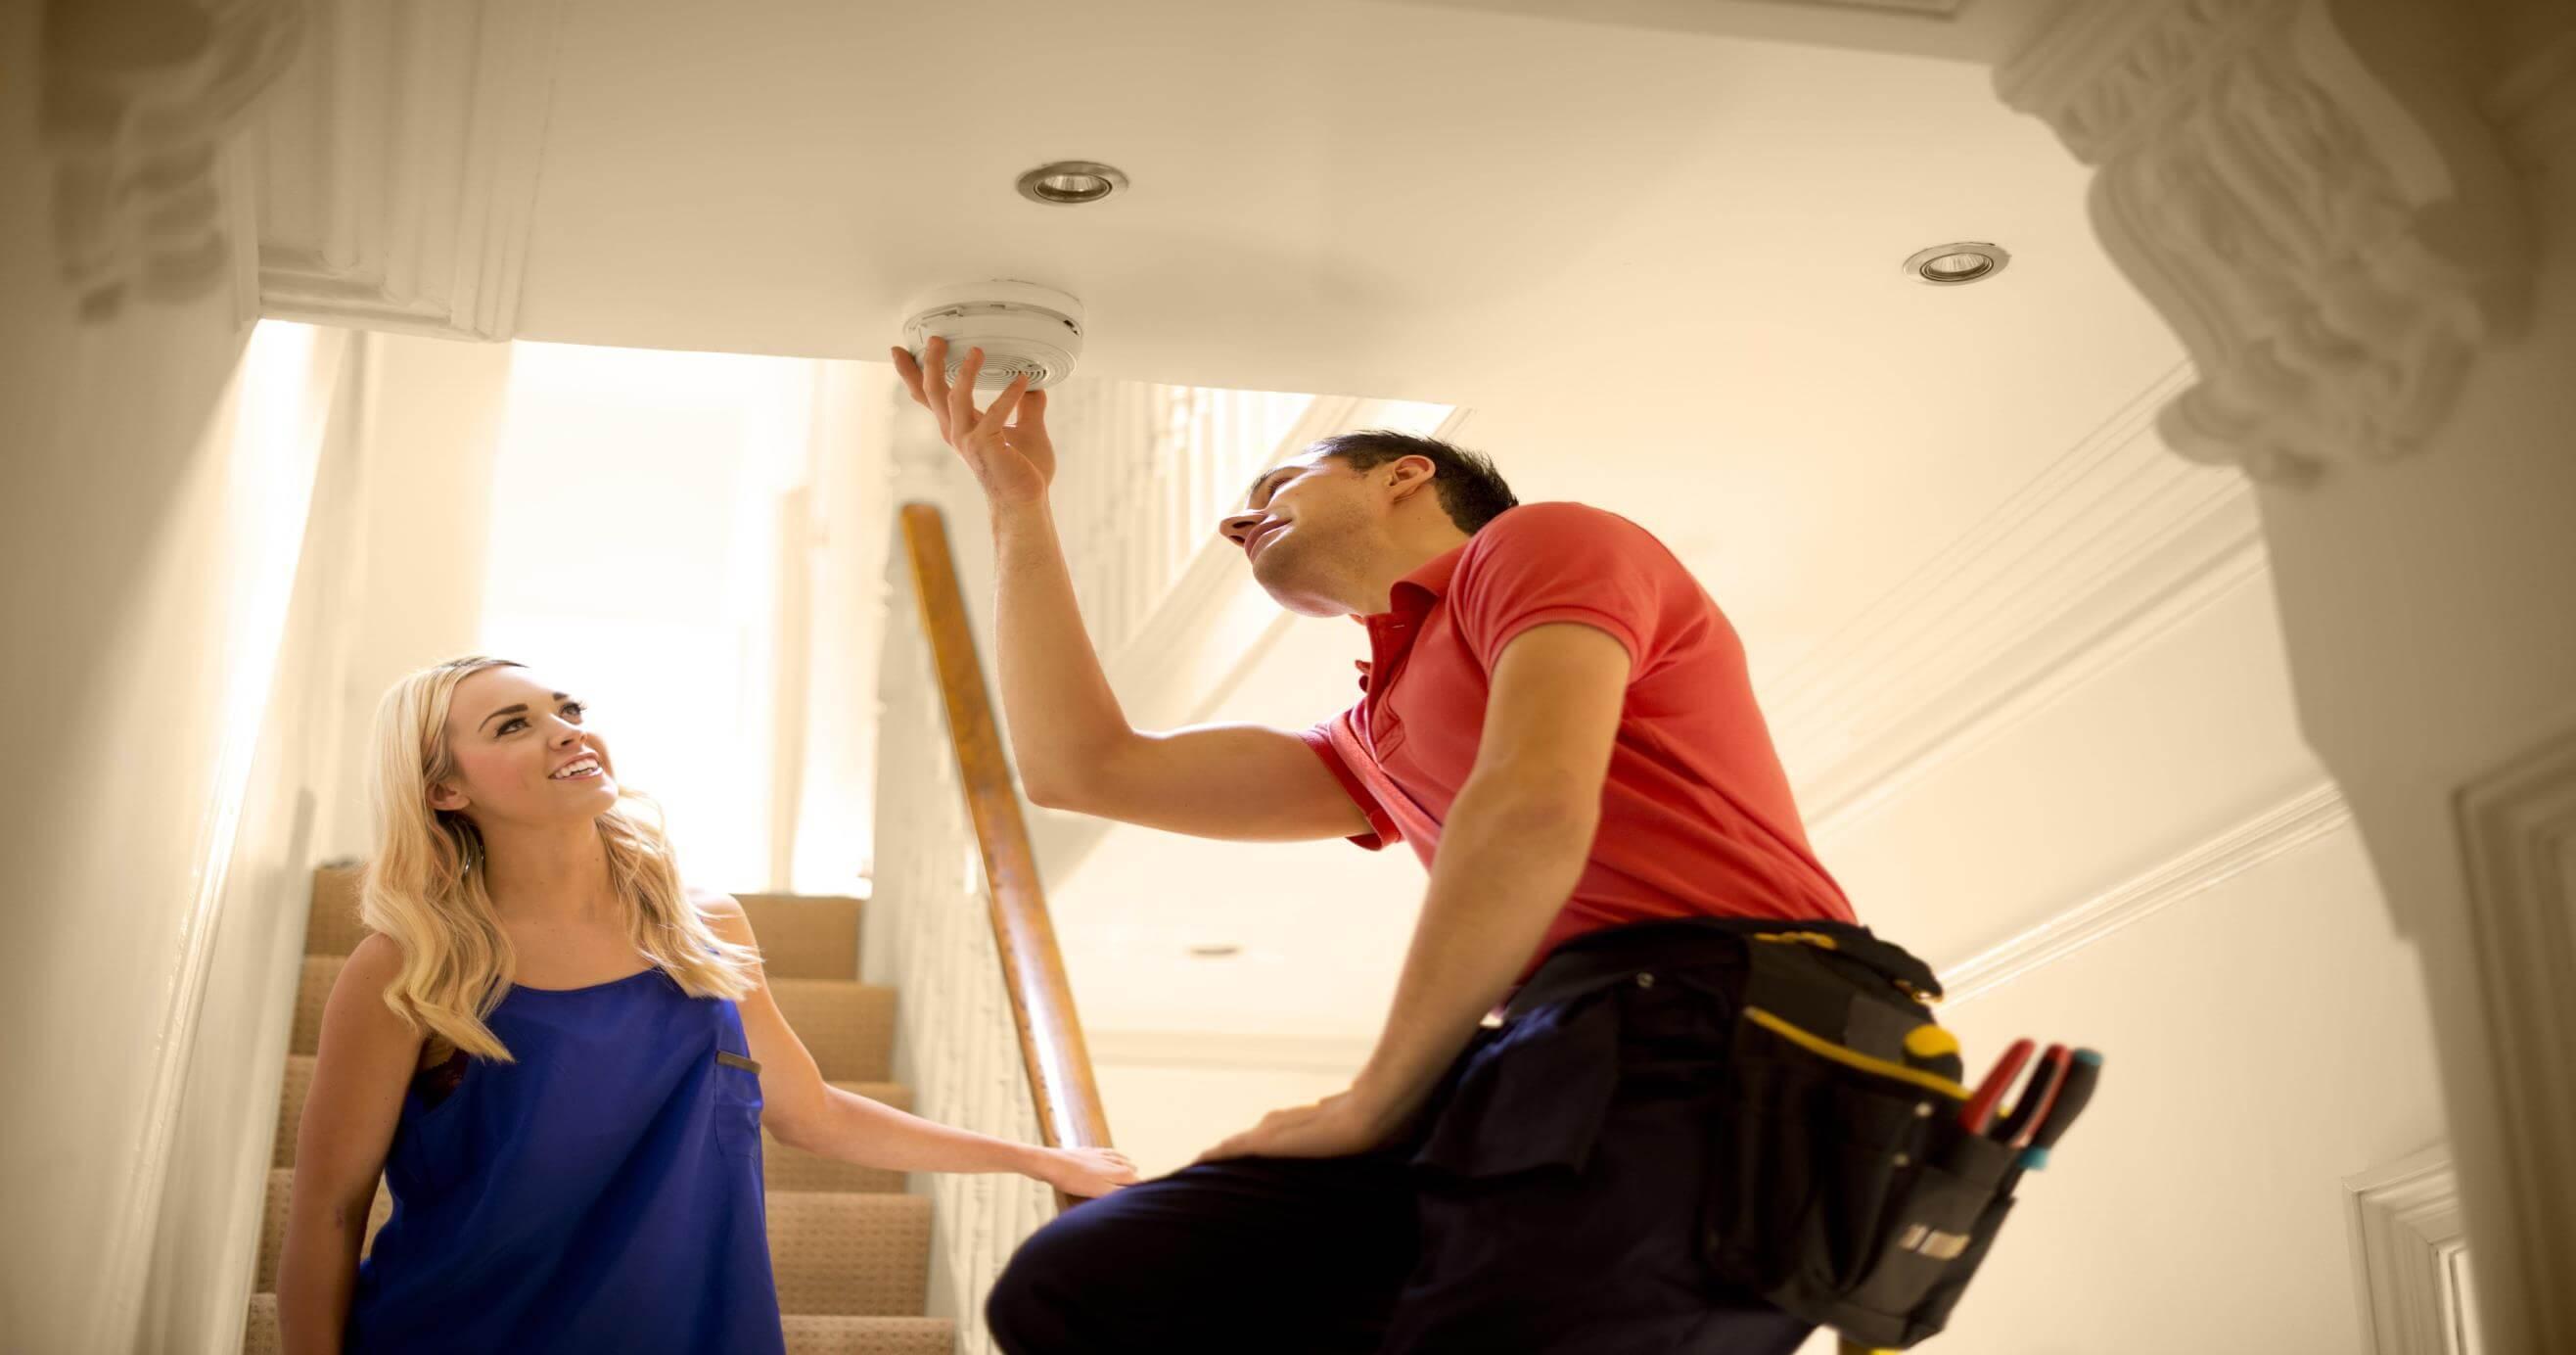 How to Install Carbon Monoxide Detector